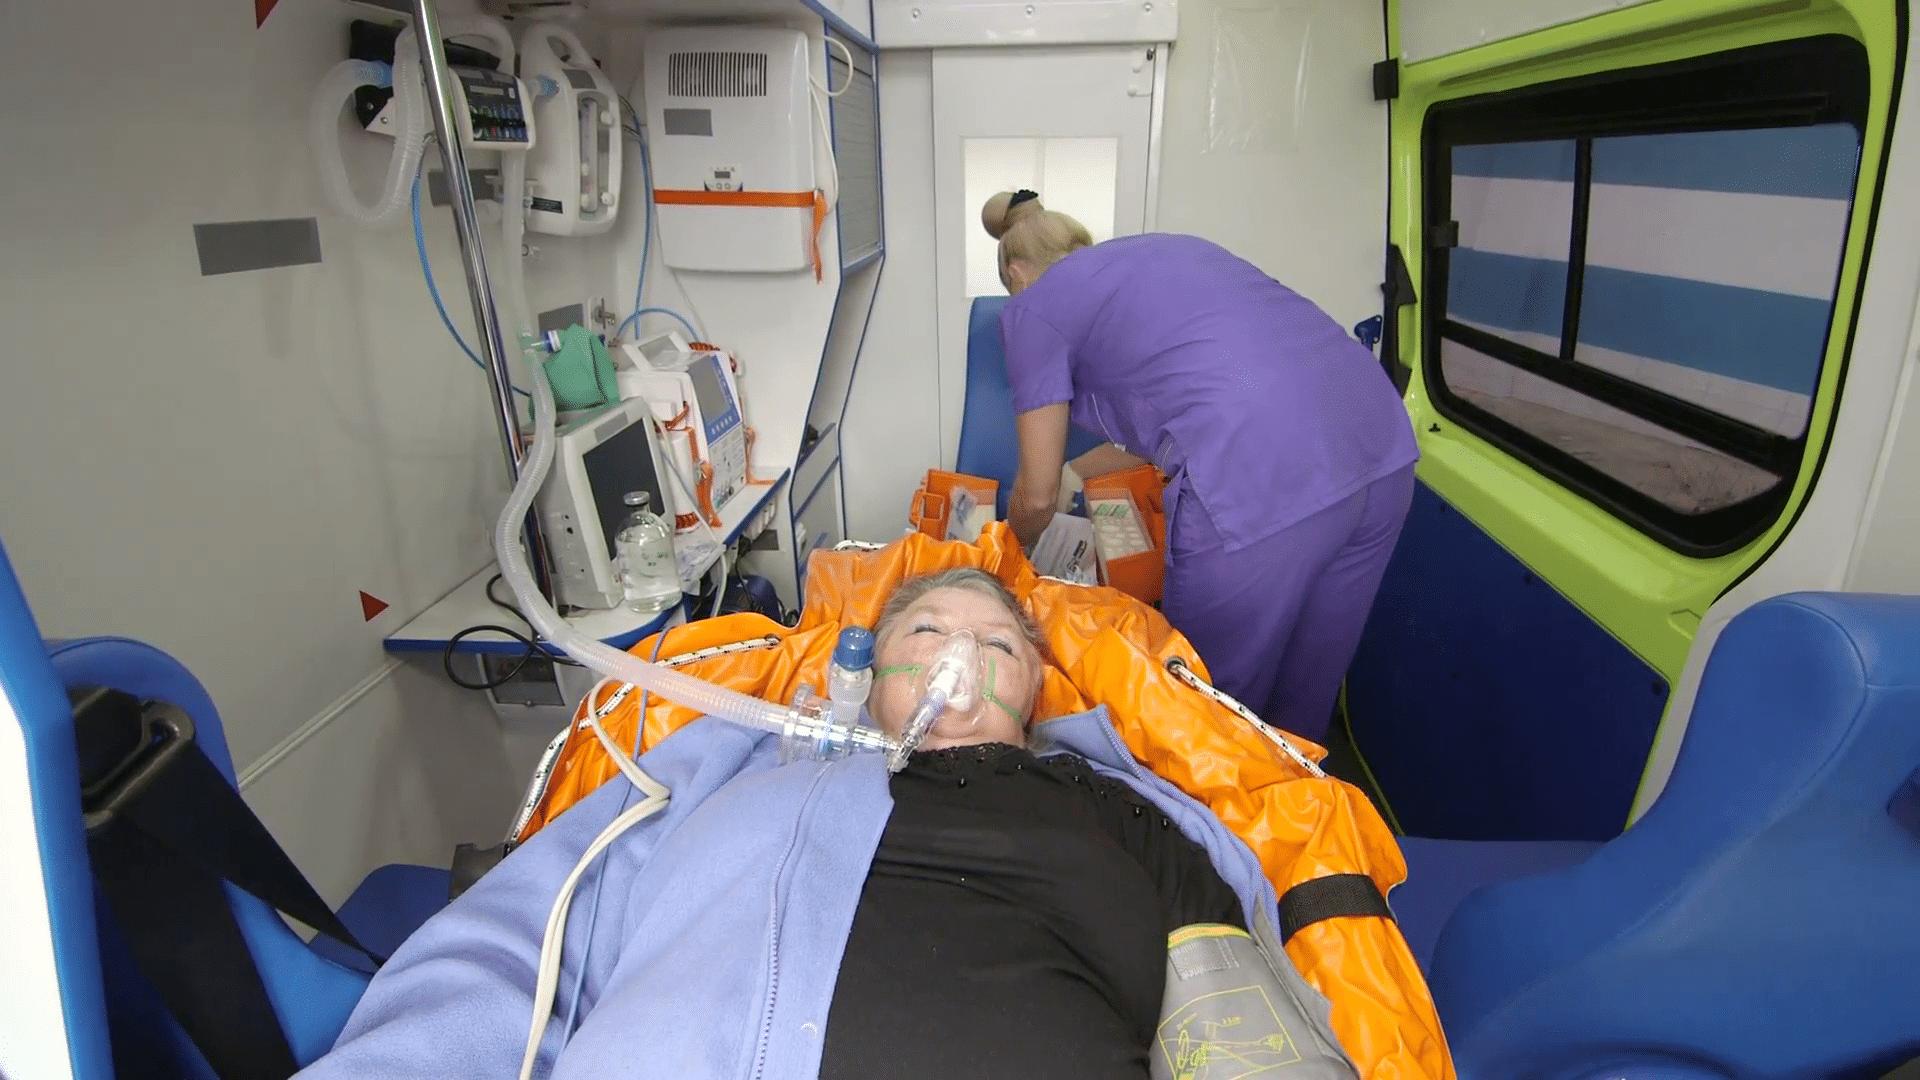 medical care and palliative care on ambulance